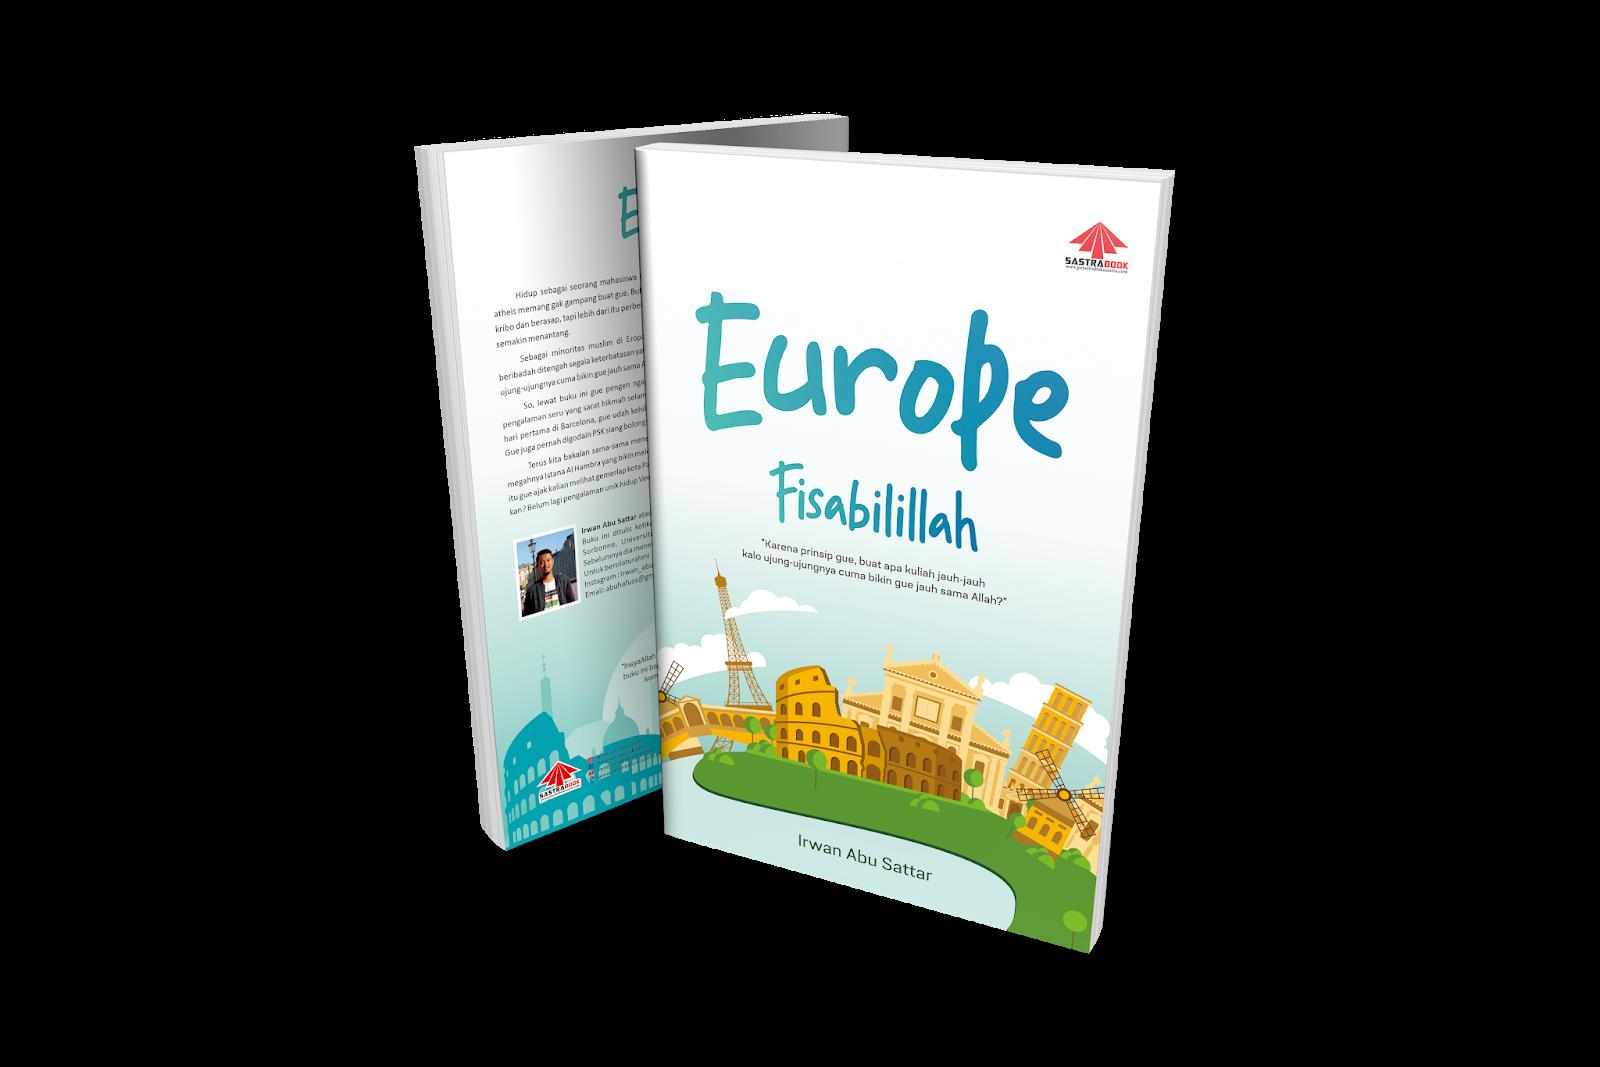 EUROPE Fisabilillah